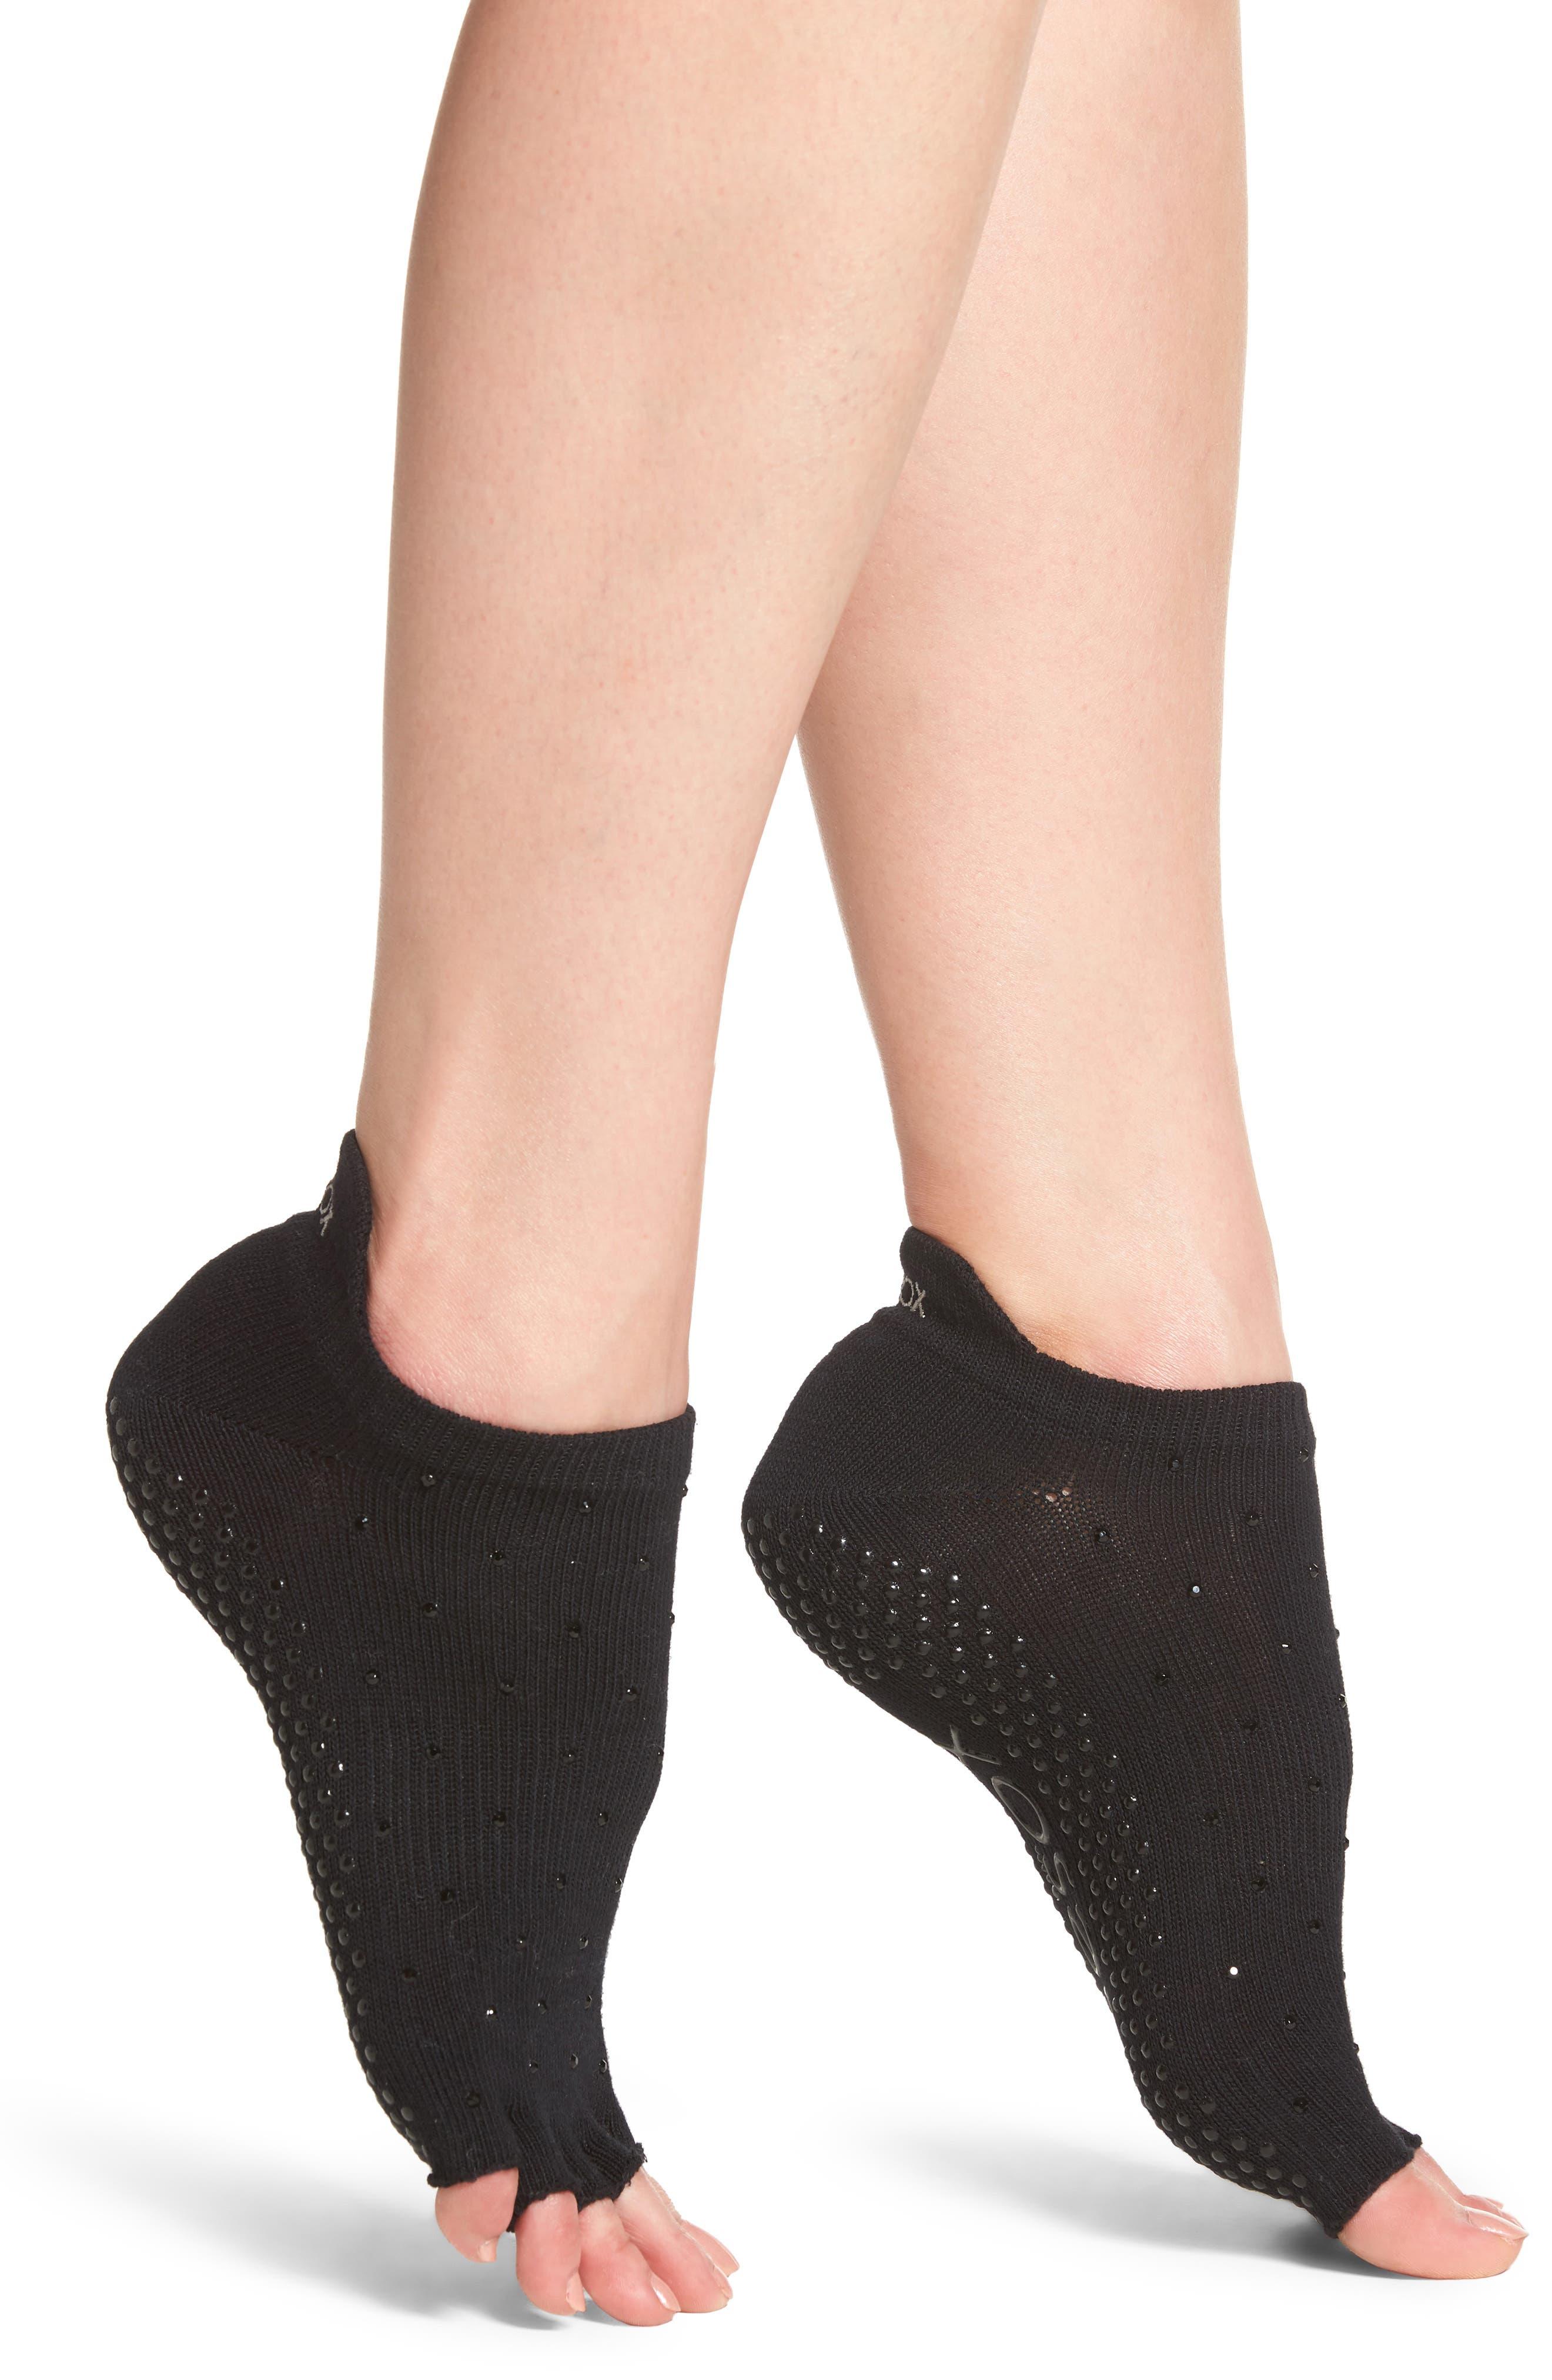 Half Toe Low Rise Grip Socks,                         Main,                         color, Nightlife